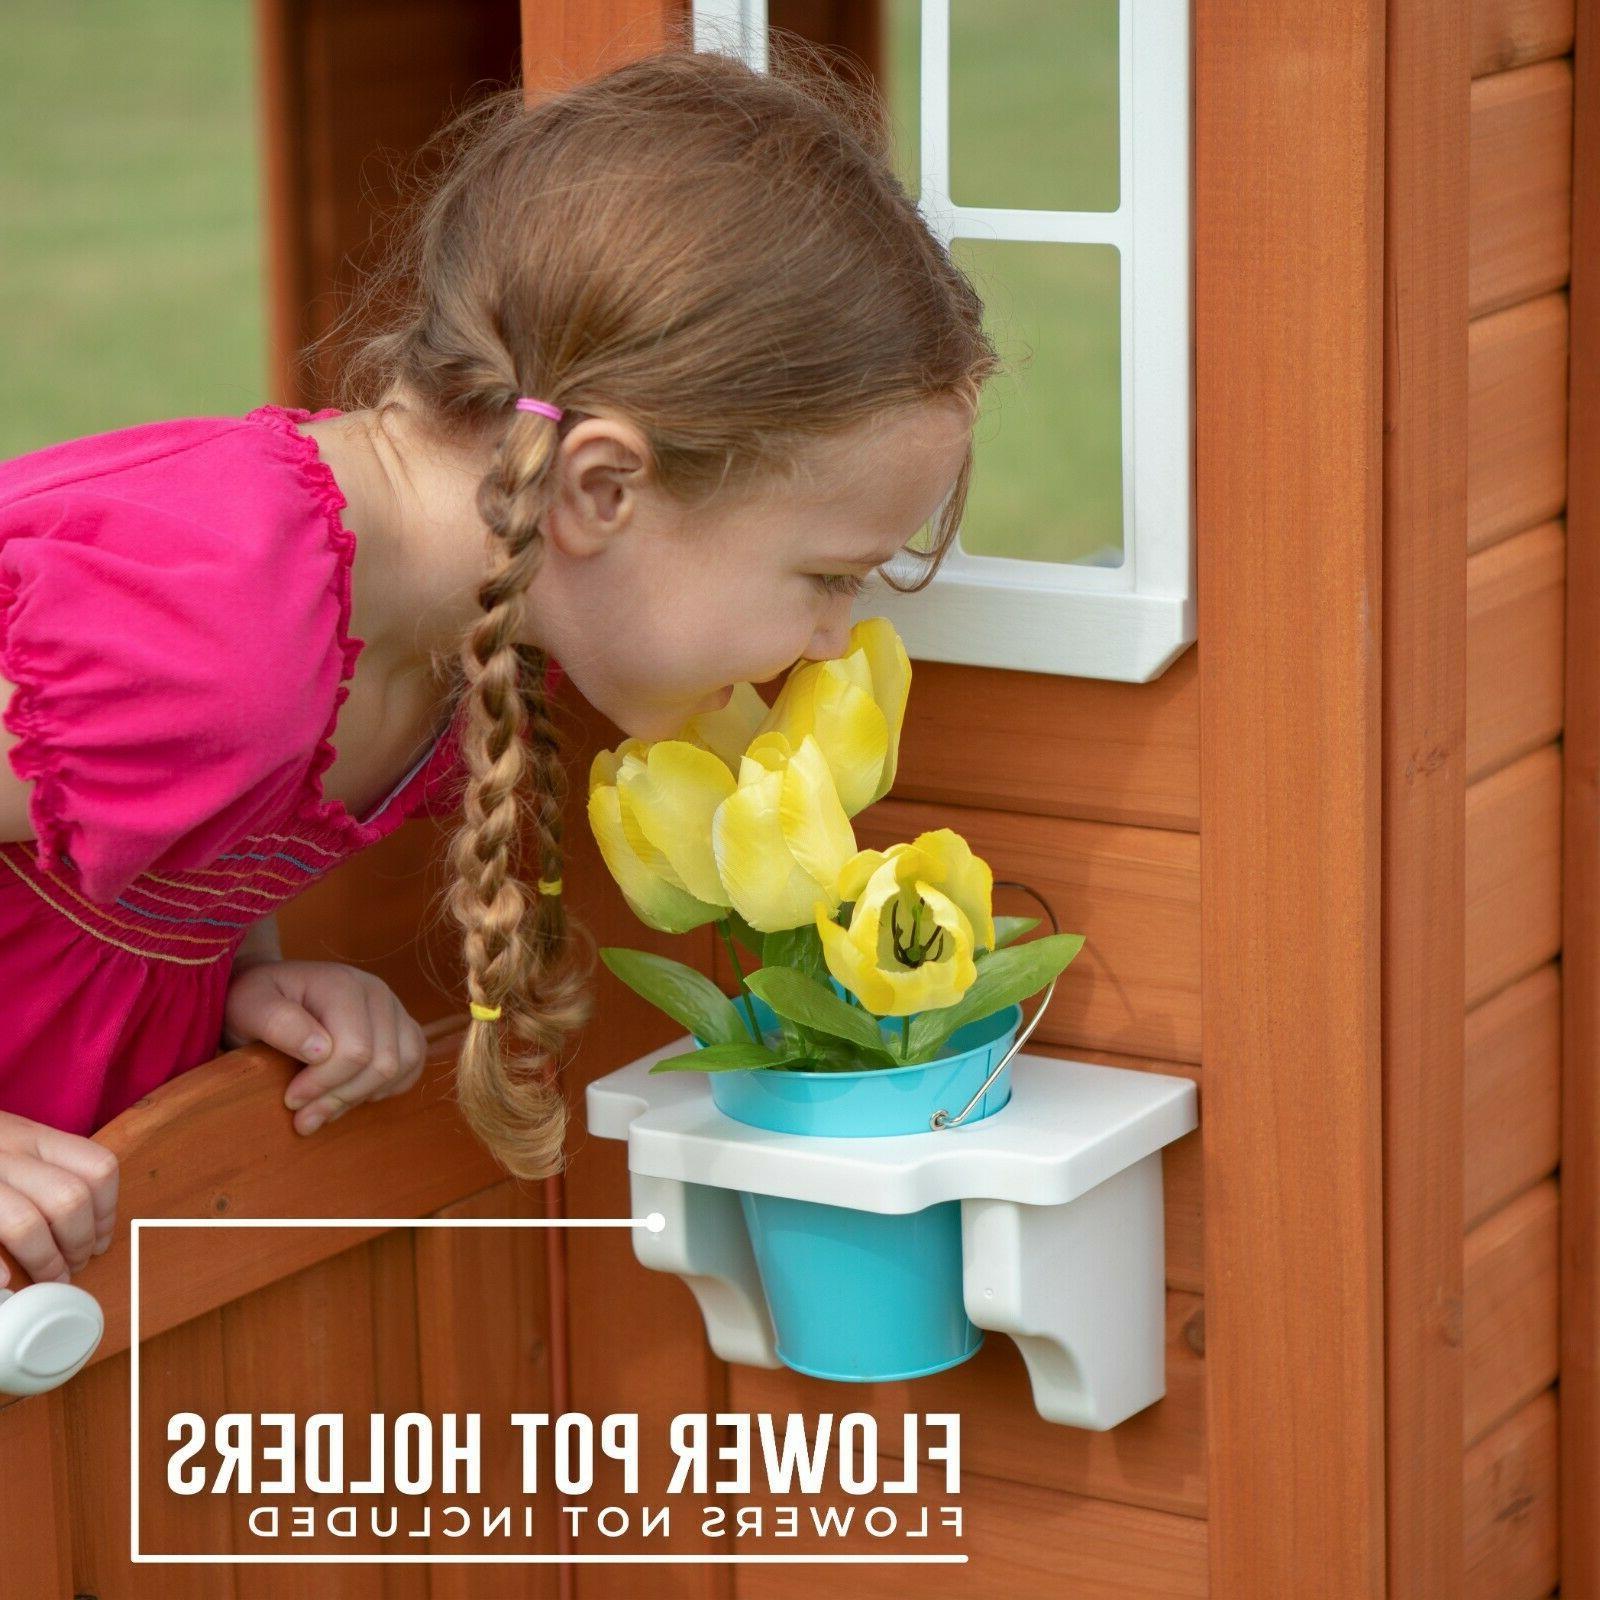 Backyard Outdoor Wooden Kids Girls Fun